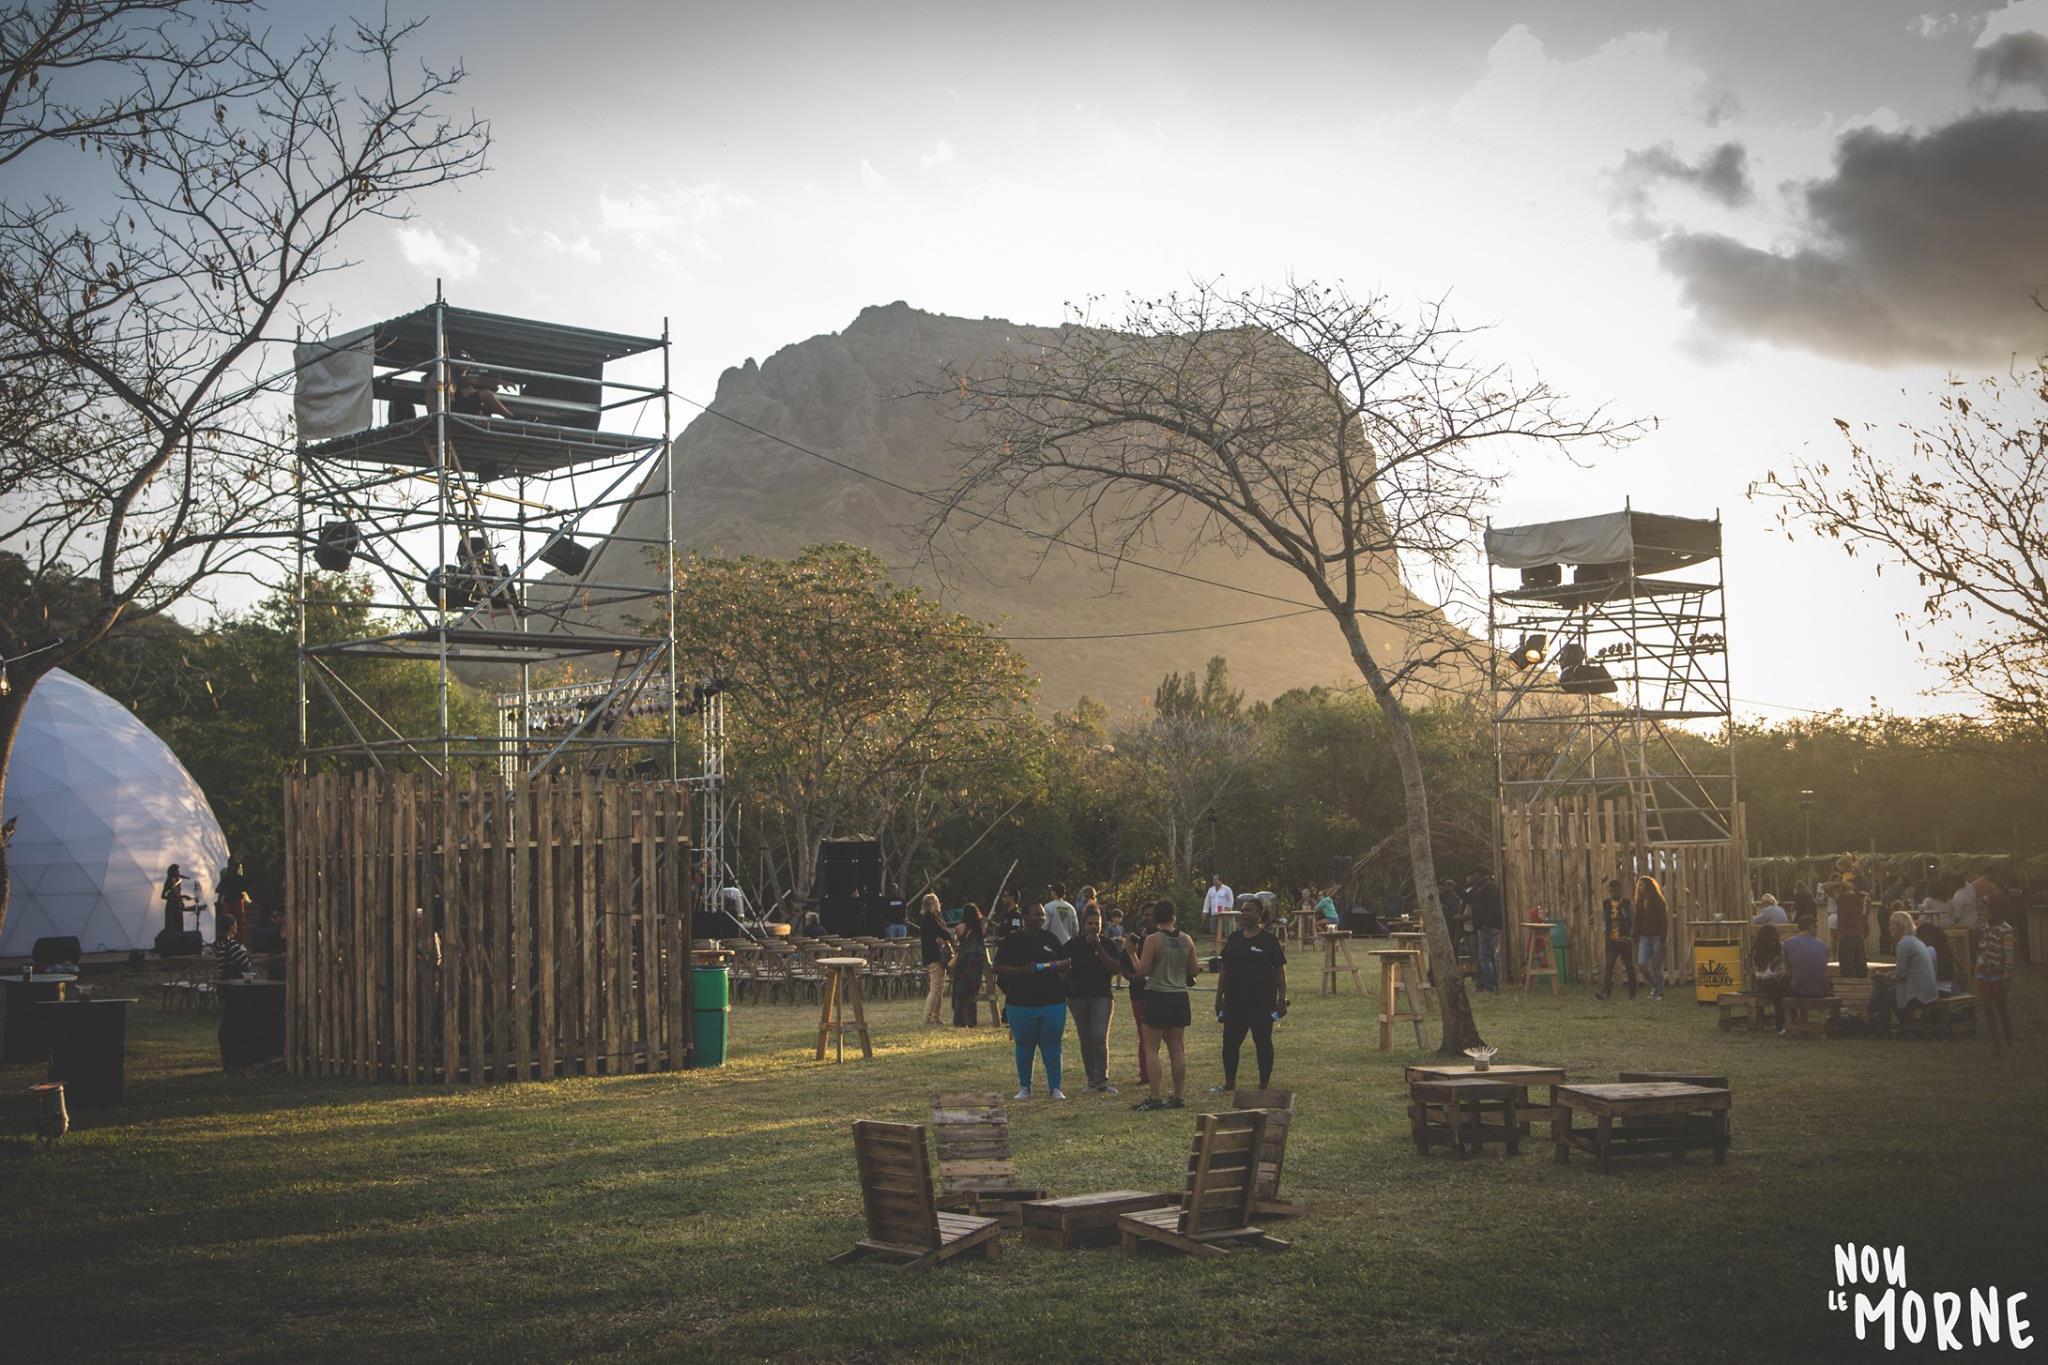 Nou Le Morne Festival 2018, The Green Village, Coteau Raffin, Mauritius